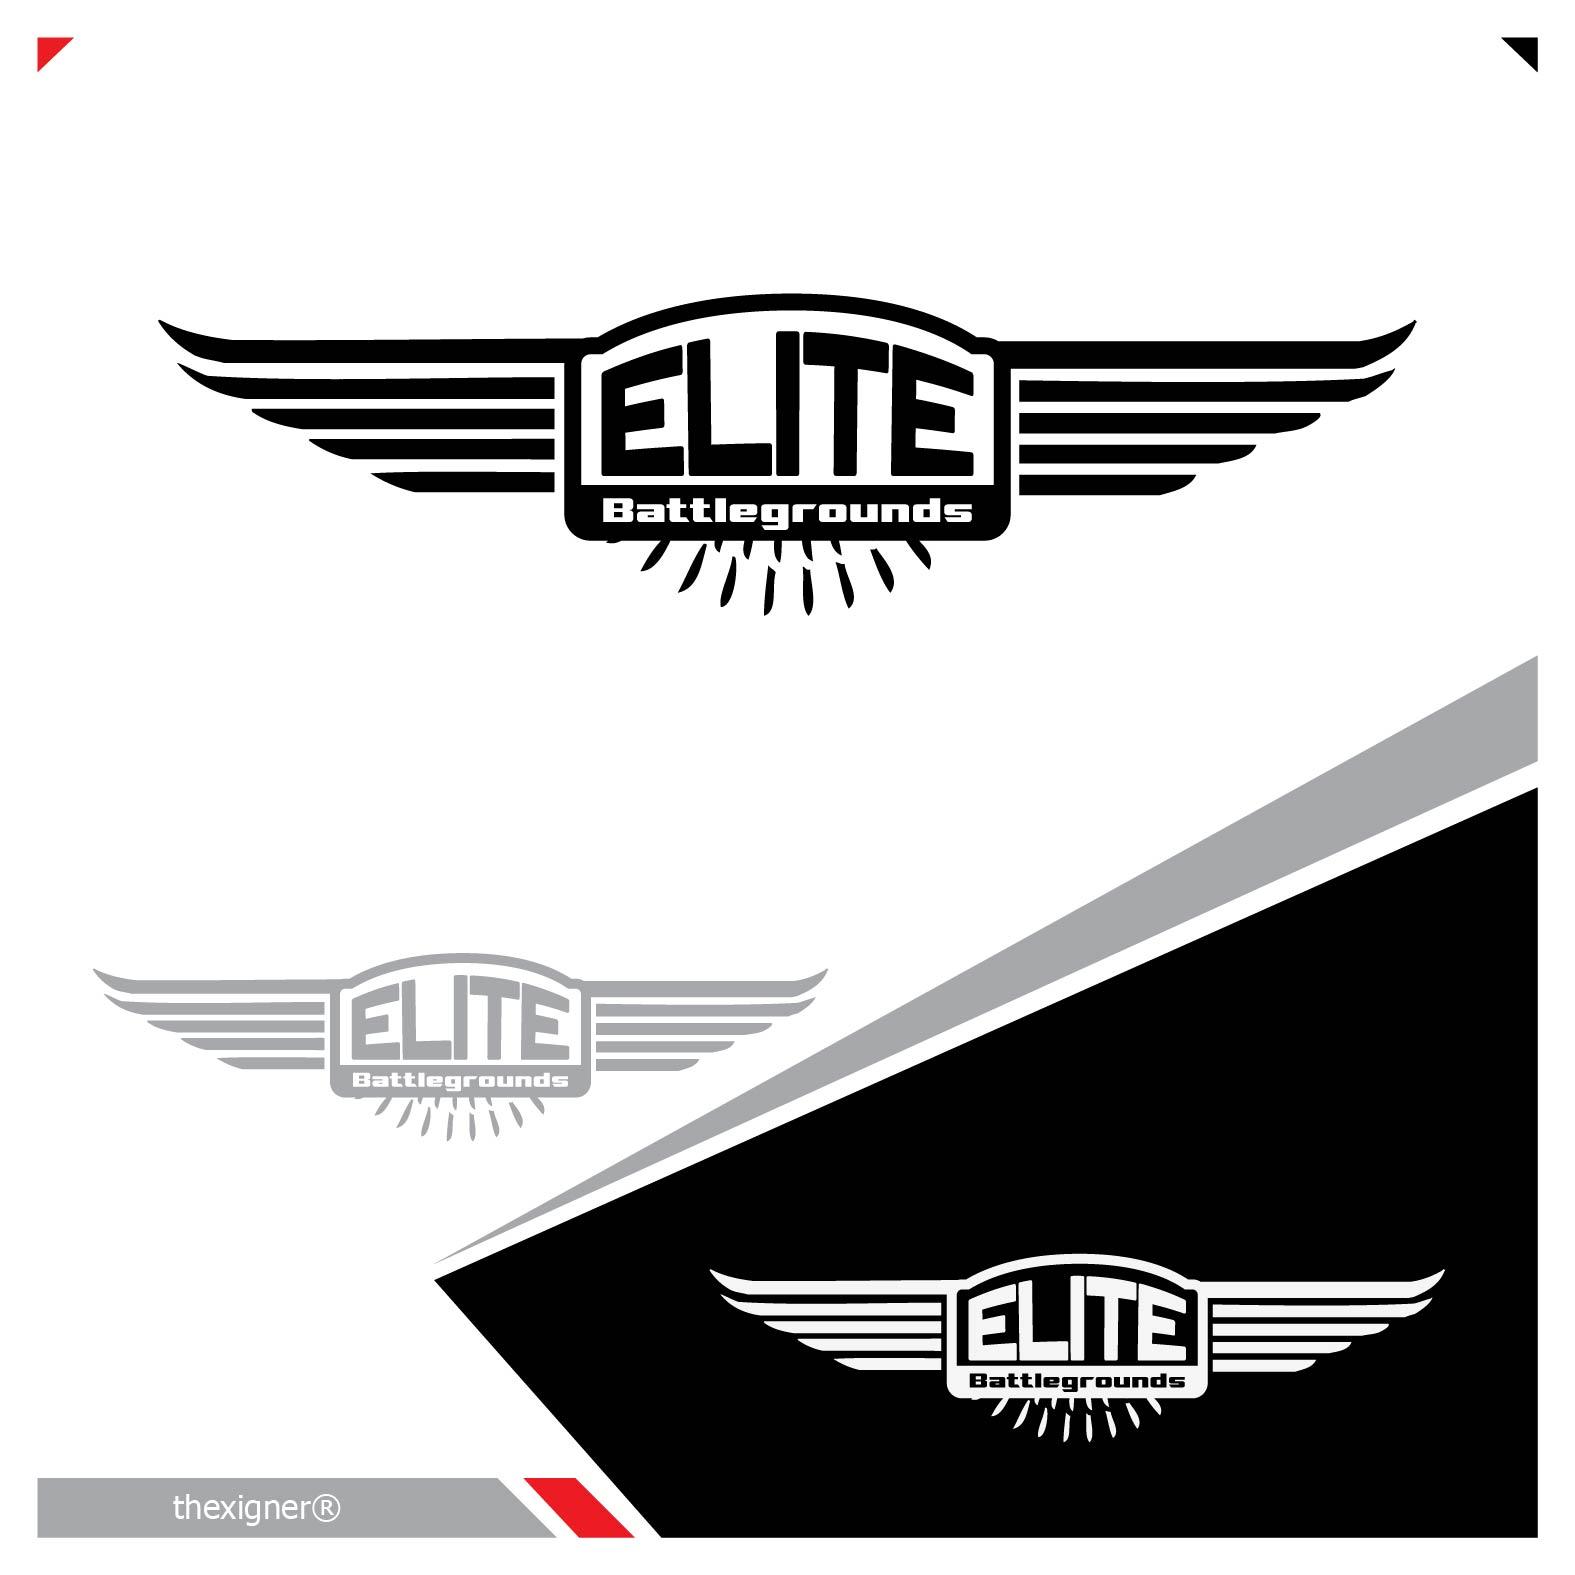 Logo Design by lagalag - Entry No. 6 in the Logo Design Contest Creative Logo Design for Elite Battlegrounds.